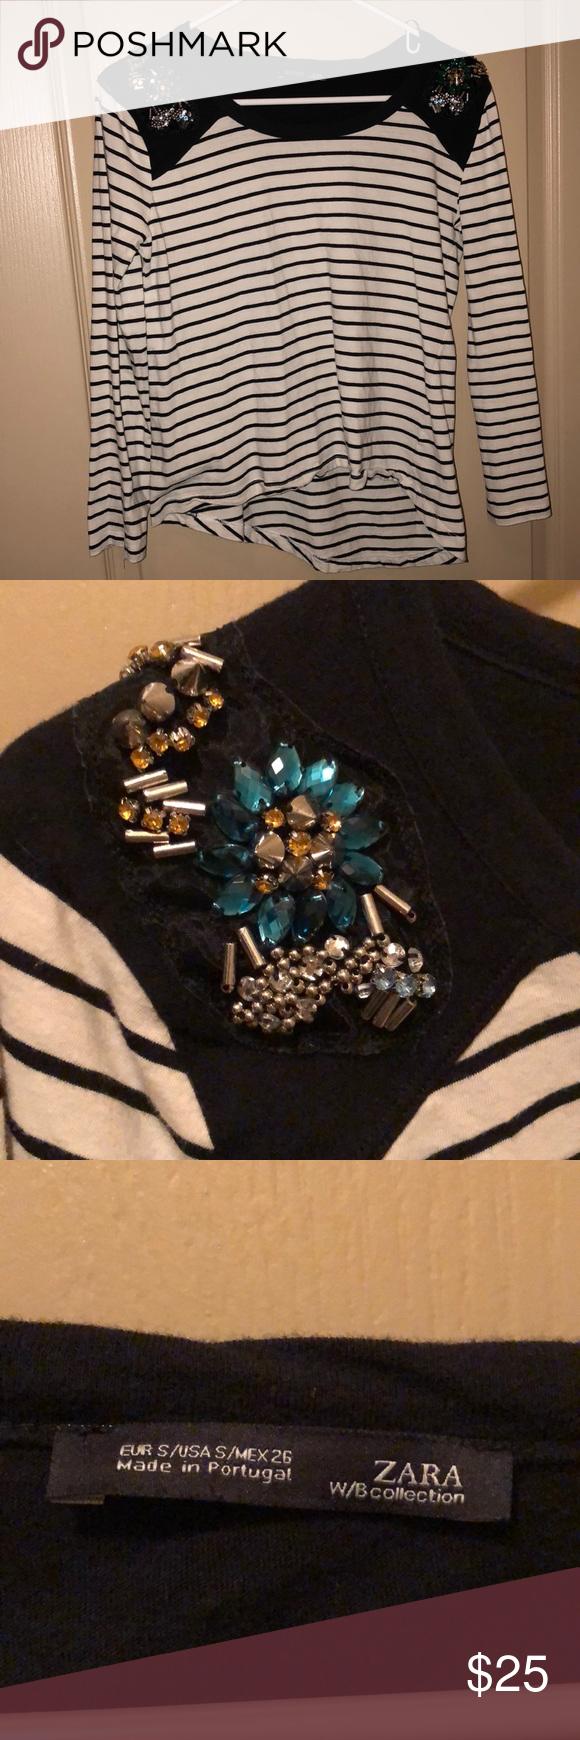 6087c6906f6d6 Zara - Oblong Gem Embroidered Blouse Zara Gem embroidered Oblong Long  Sleeve Blouse. Never worn. No tags. Zara Tops Blouses